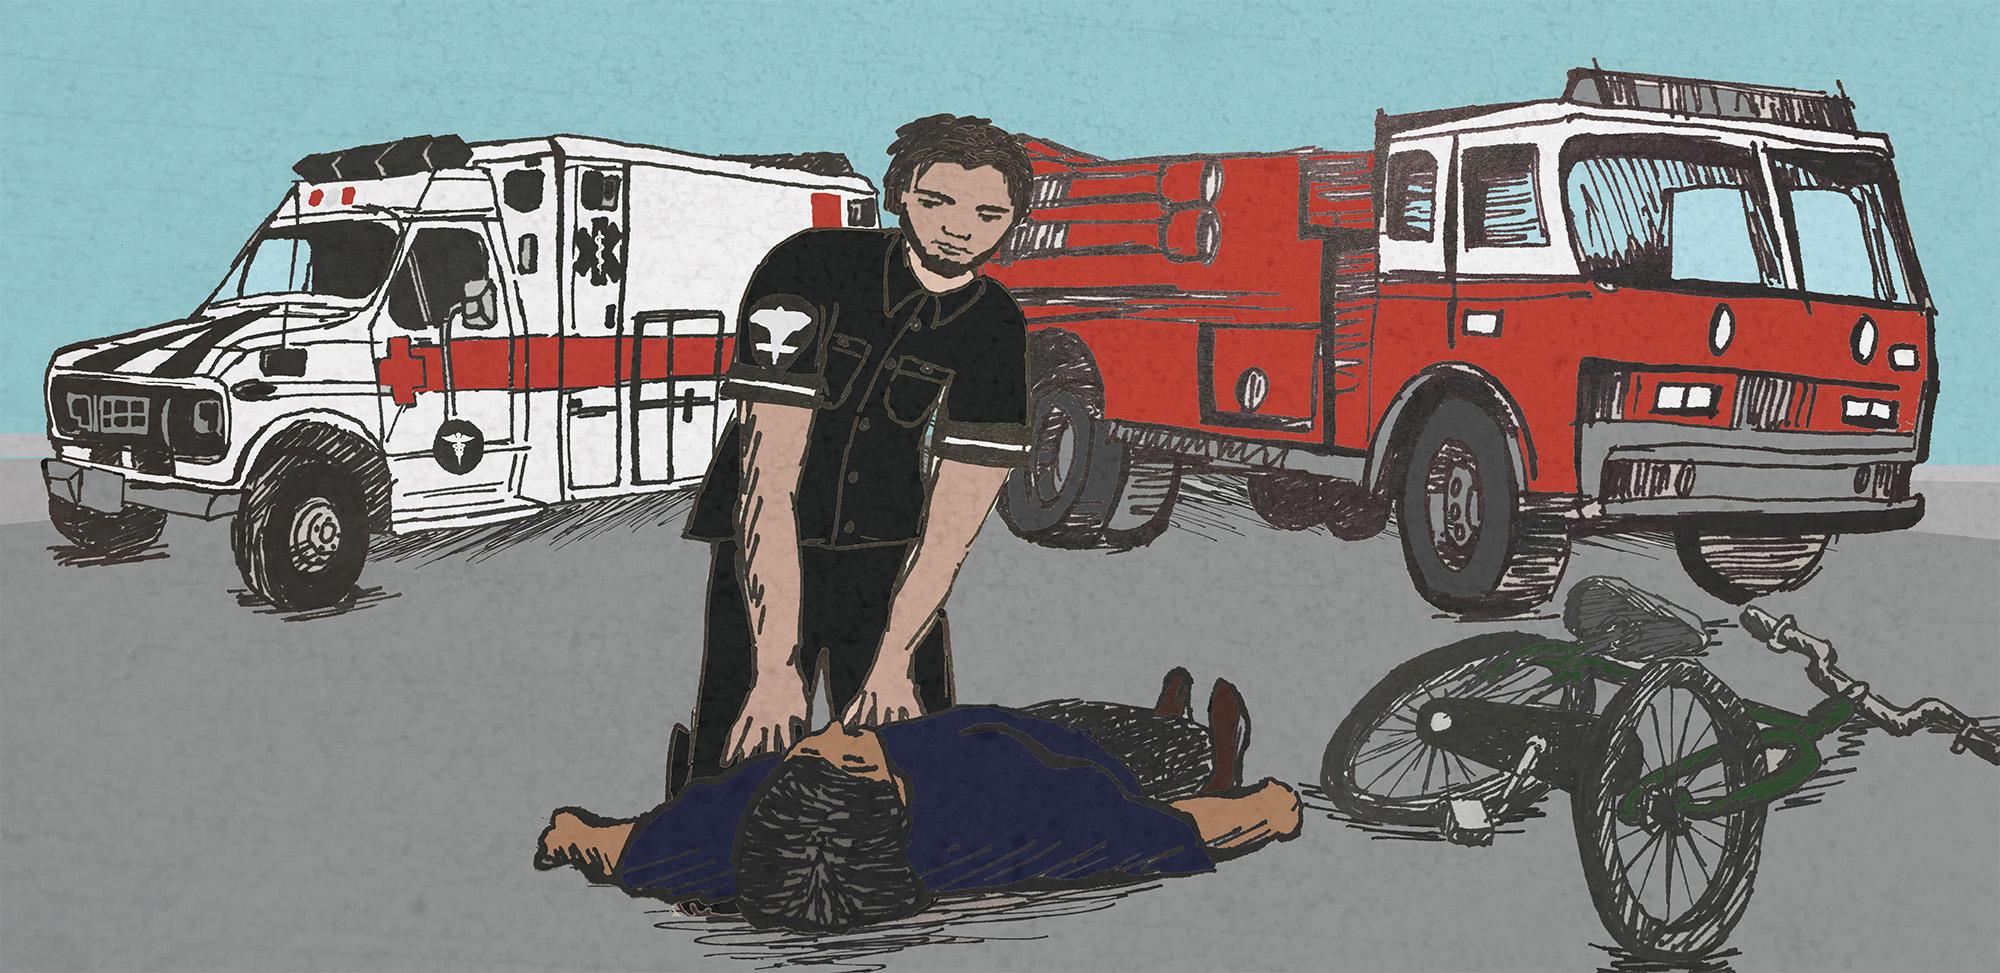 First Responder  Why Do Fire Trucks Often Arrive Before Ambulances For  Medical Emergencies  f9e6e2e94